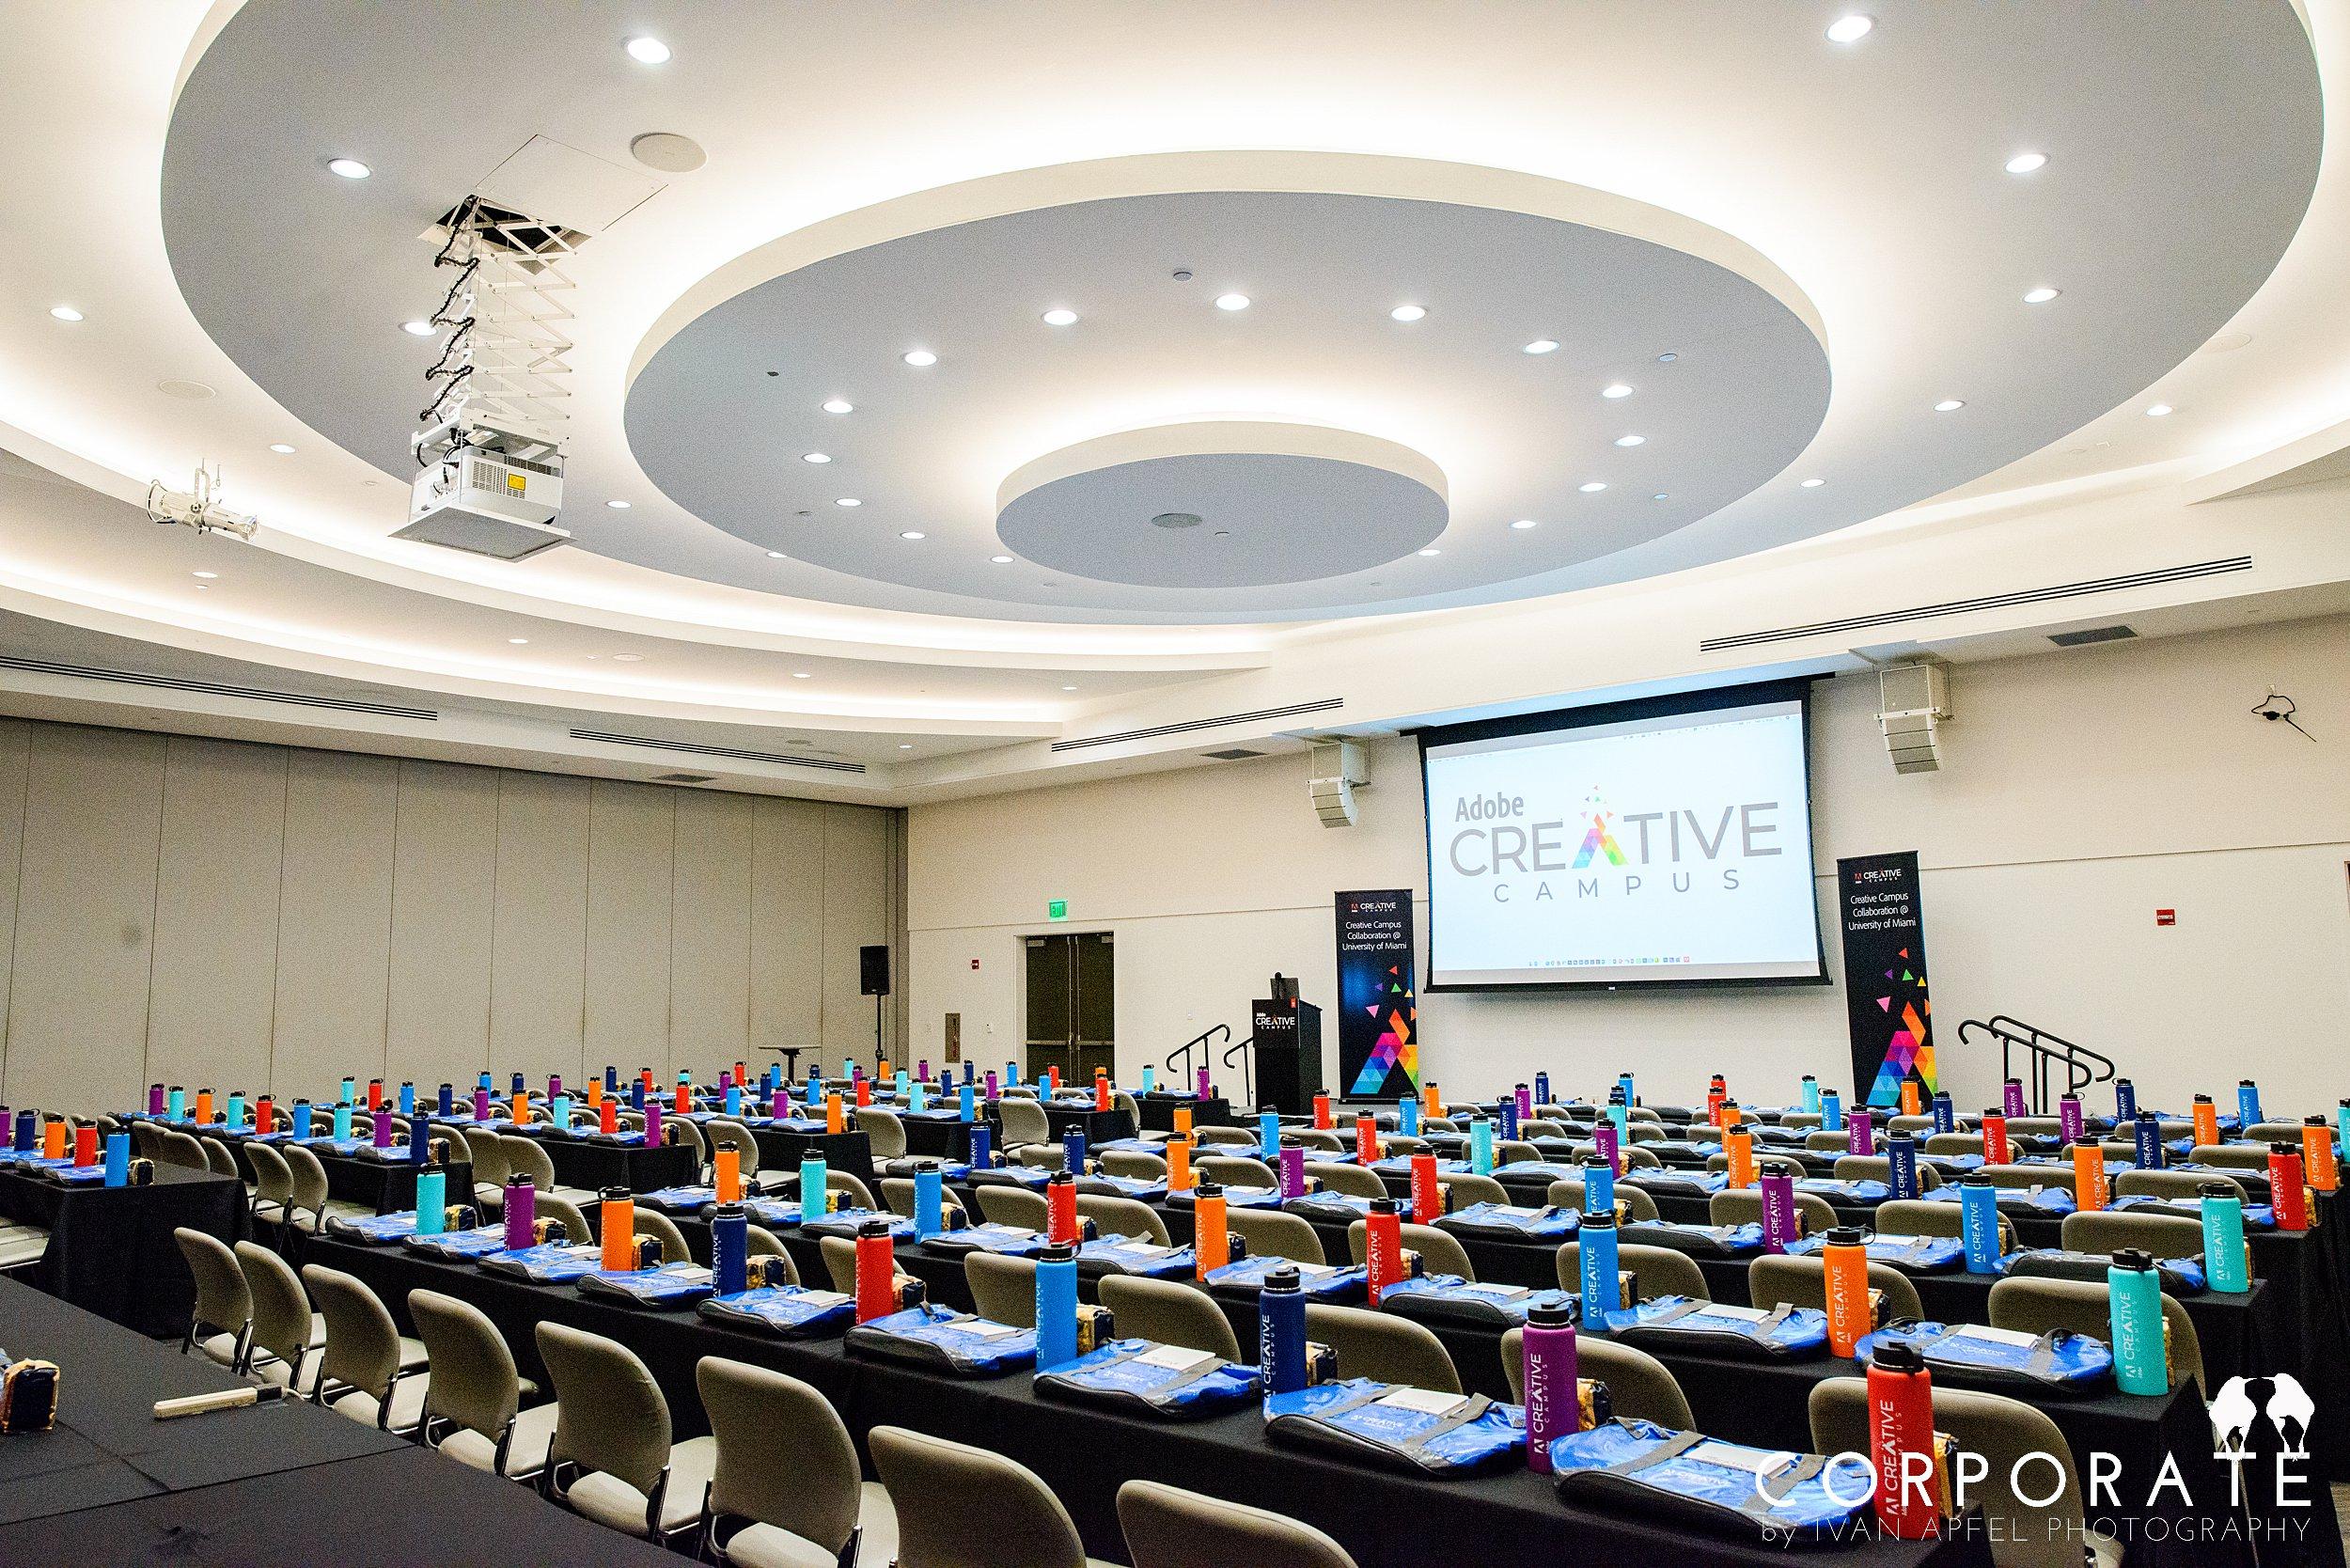 Miami Corporate Event Photographer Adobe Systems Creative Campus 2019-D2_Adobe_Creative_Campus_UMiami-_IAP8110.jpg